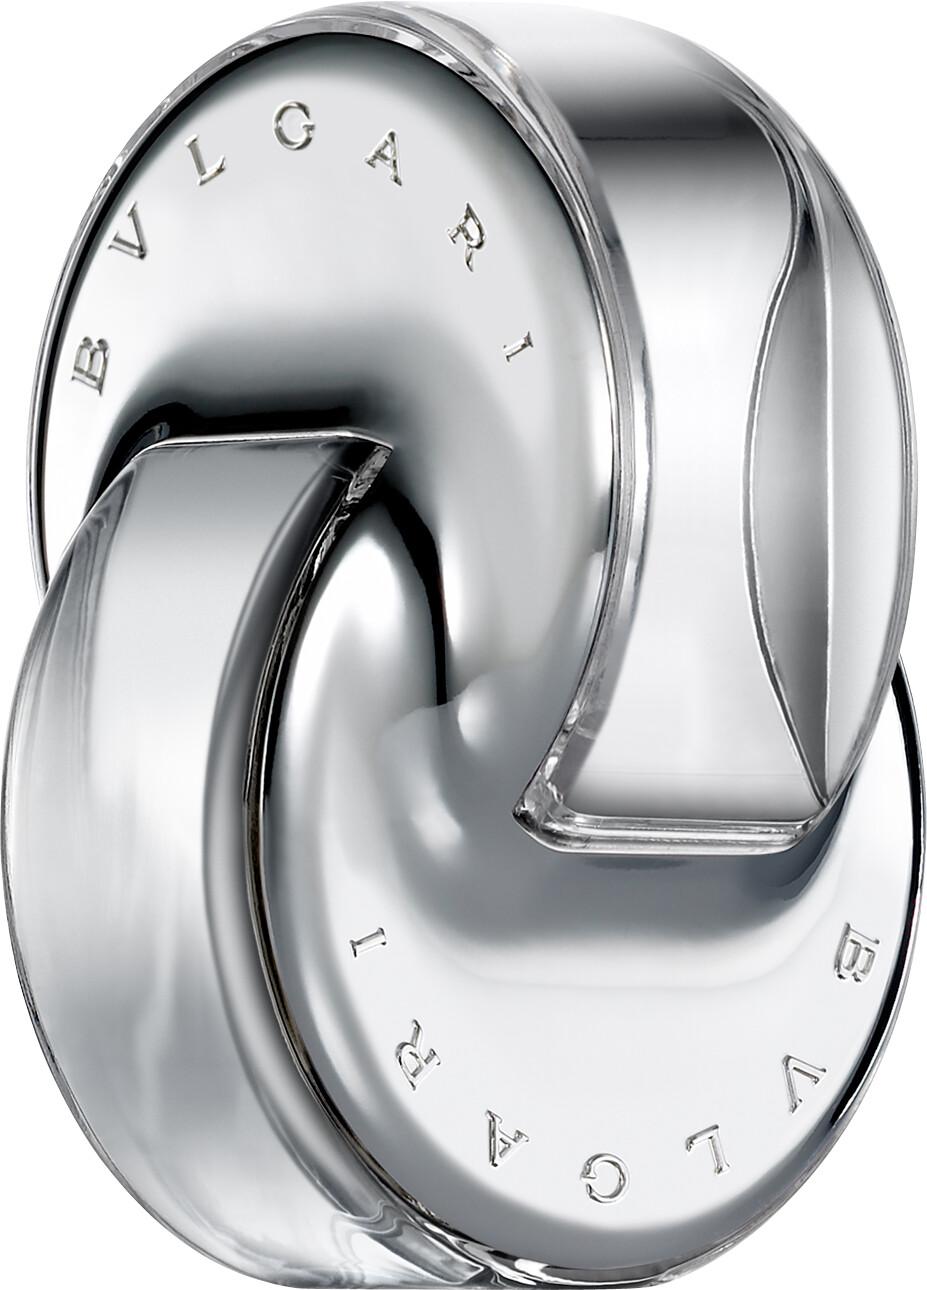 BVLGARI Omnia Crystalline Eau de Toilette Spray 40ml